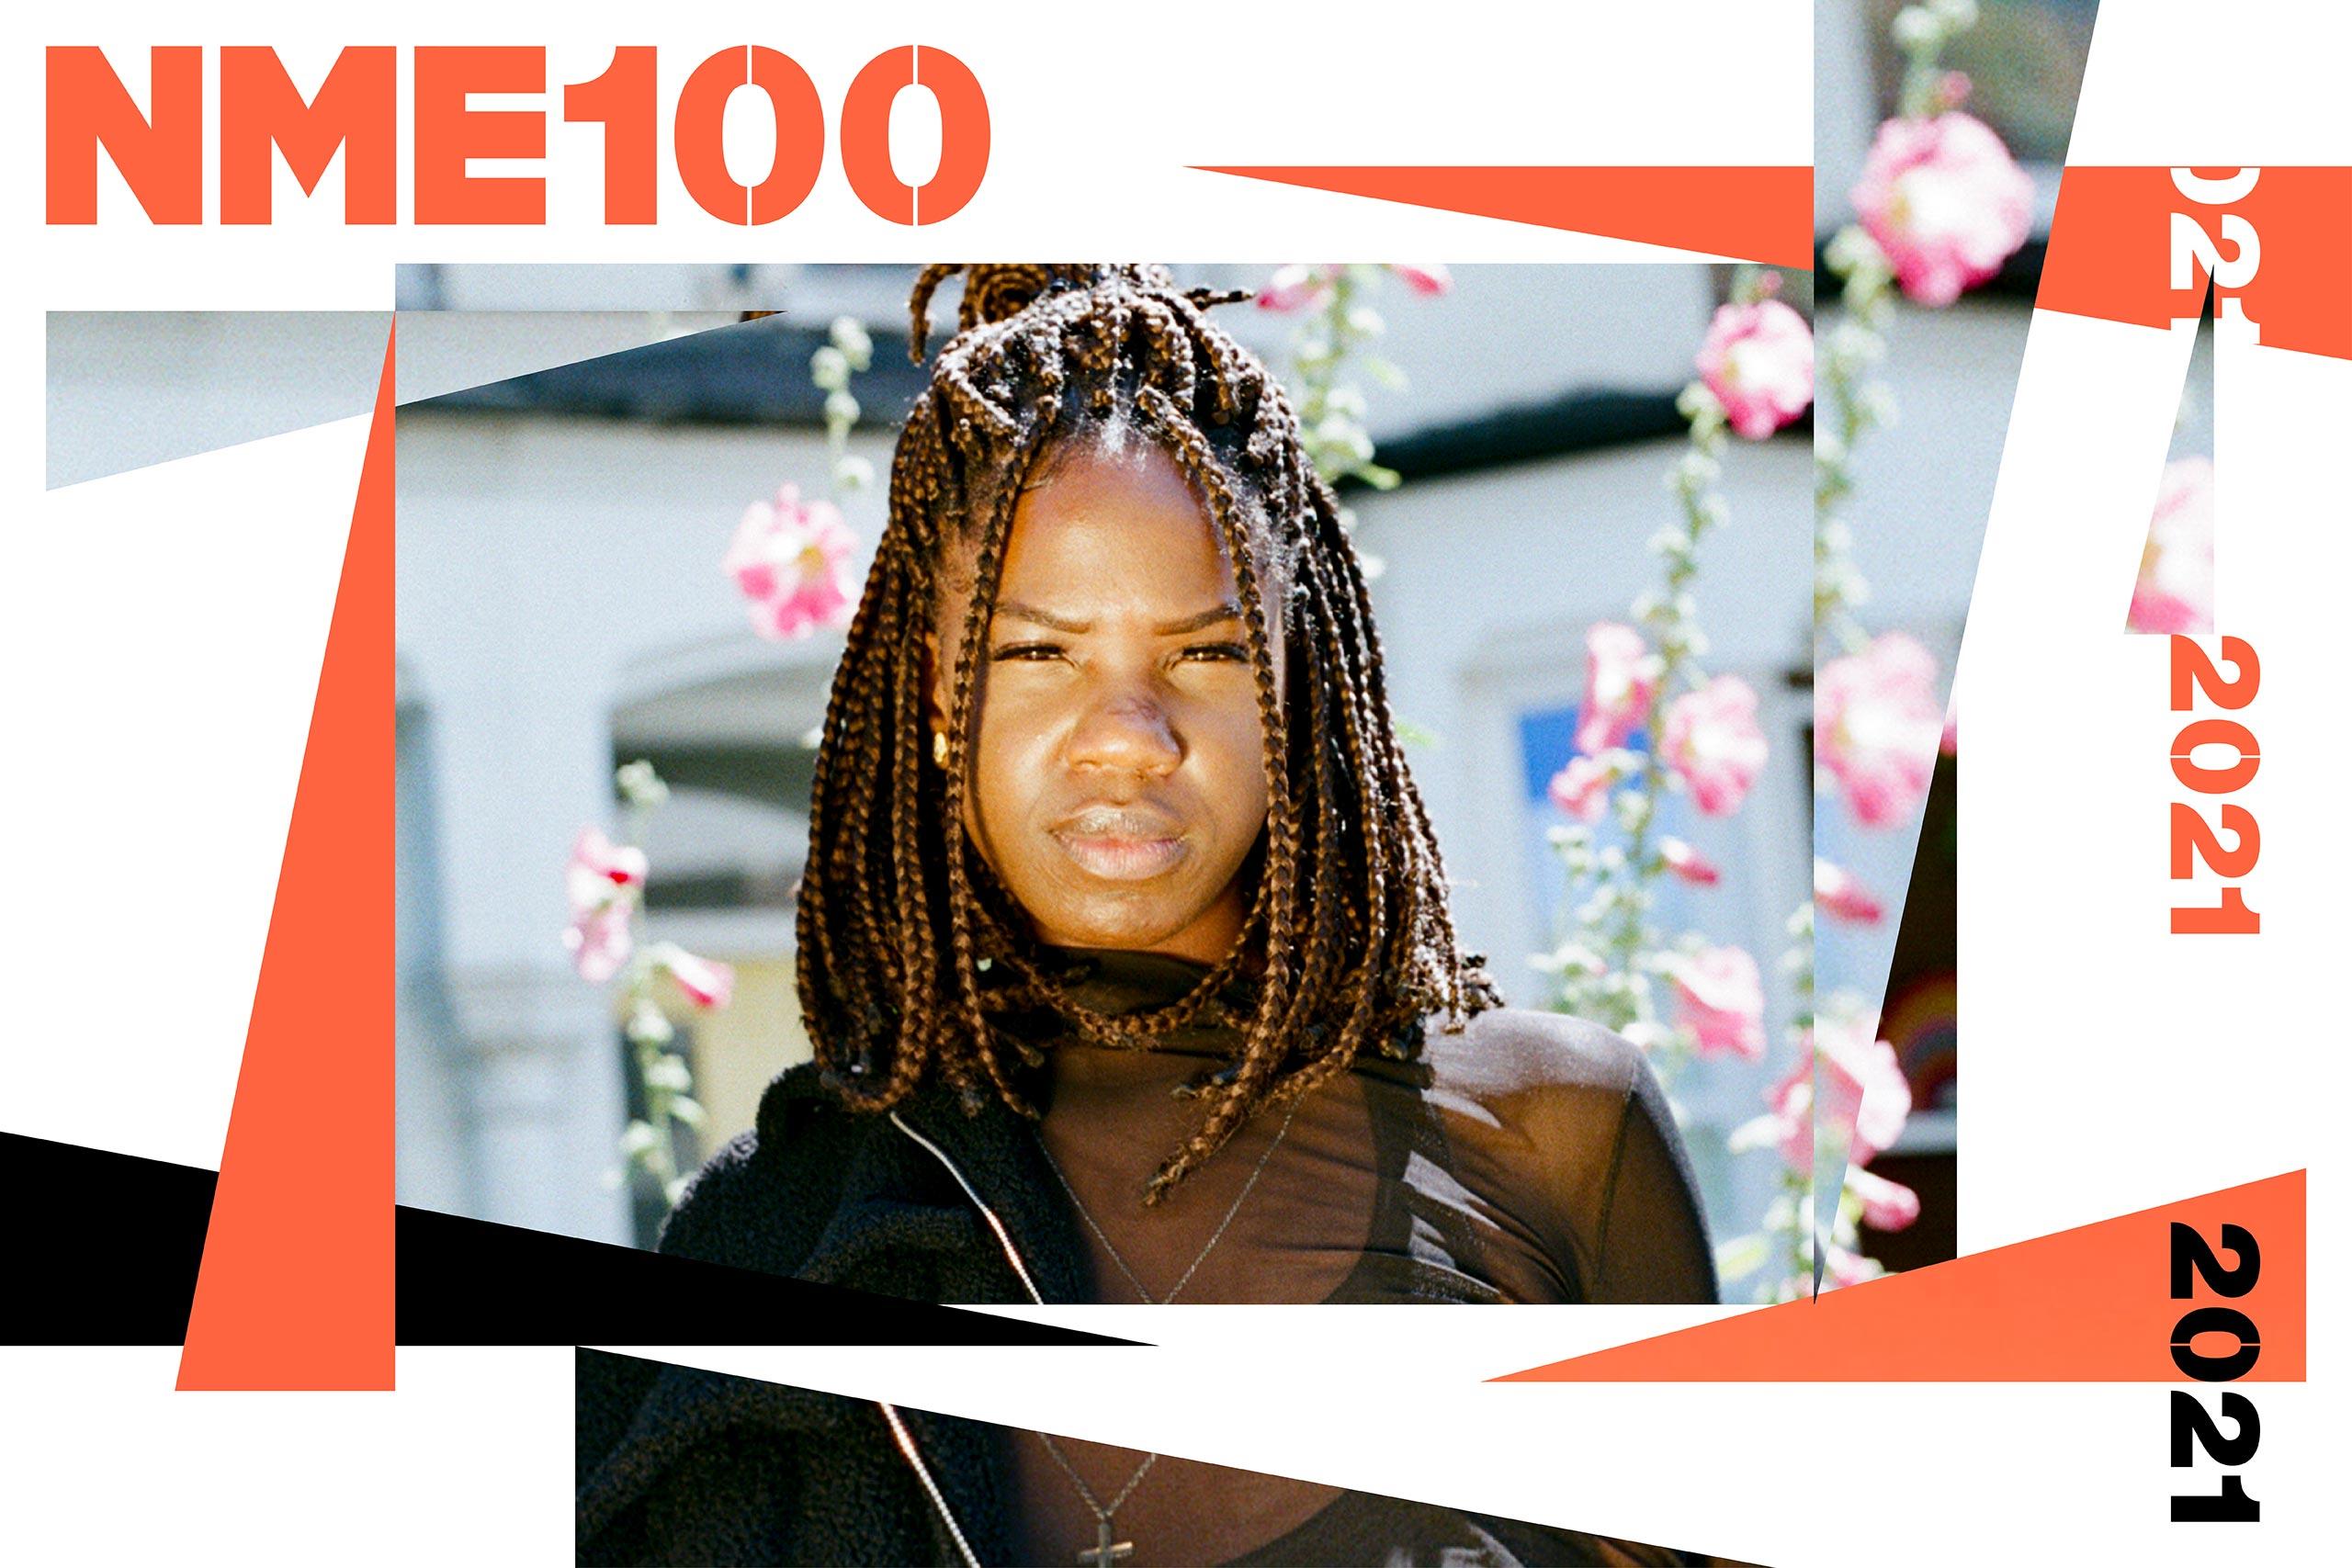 NME 100 enny